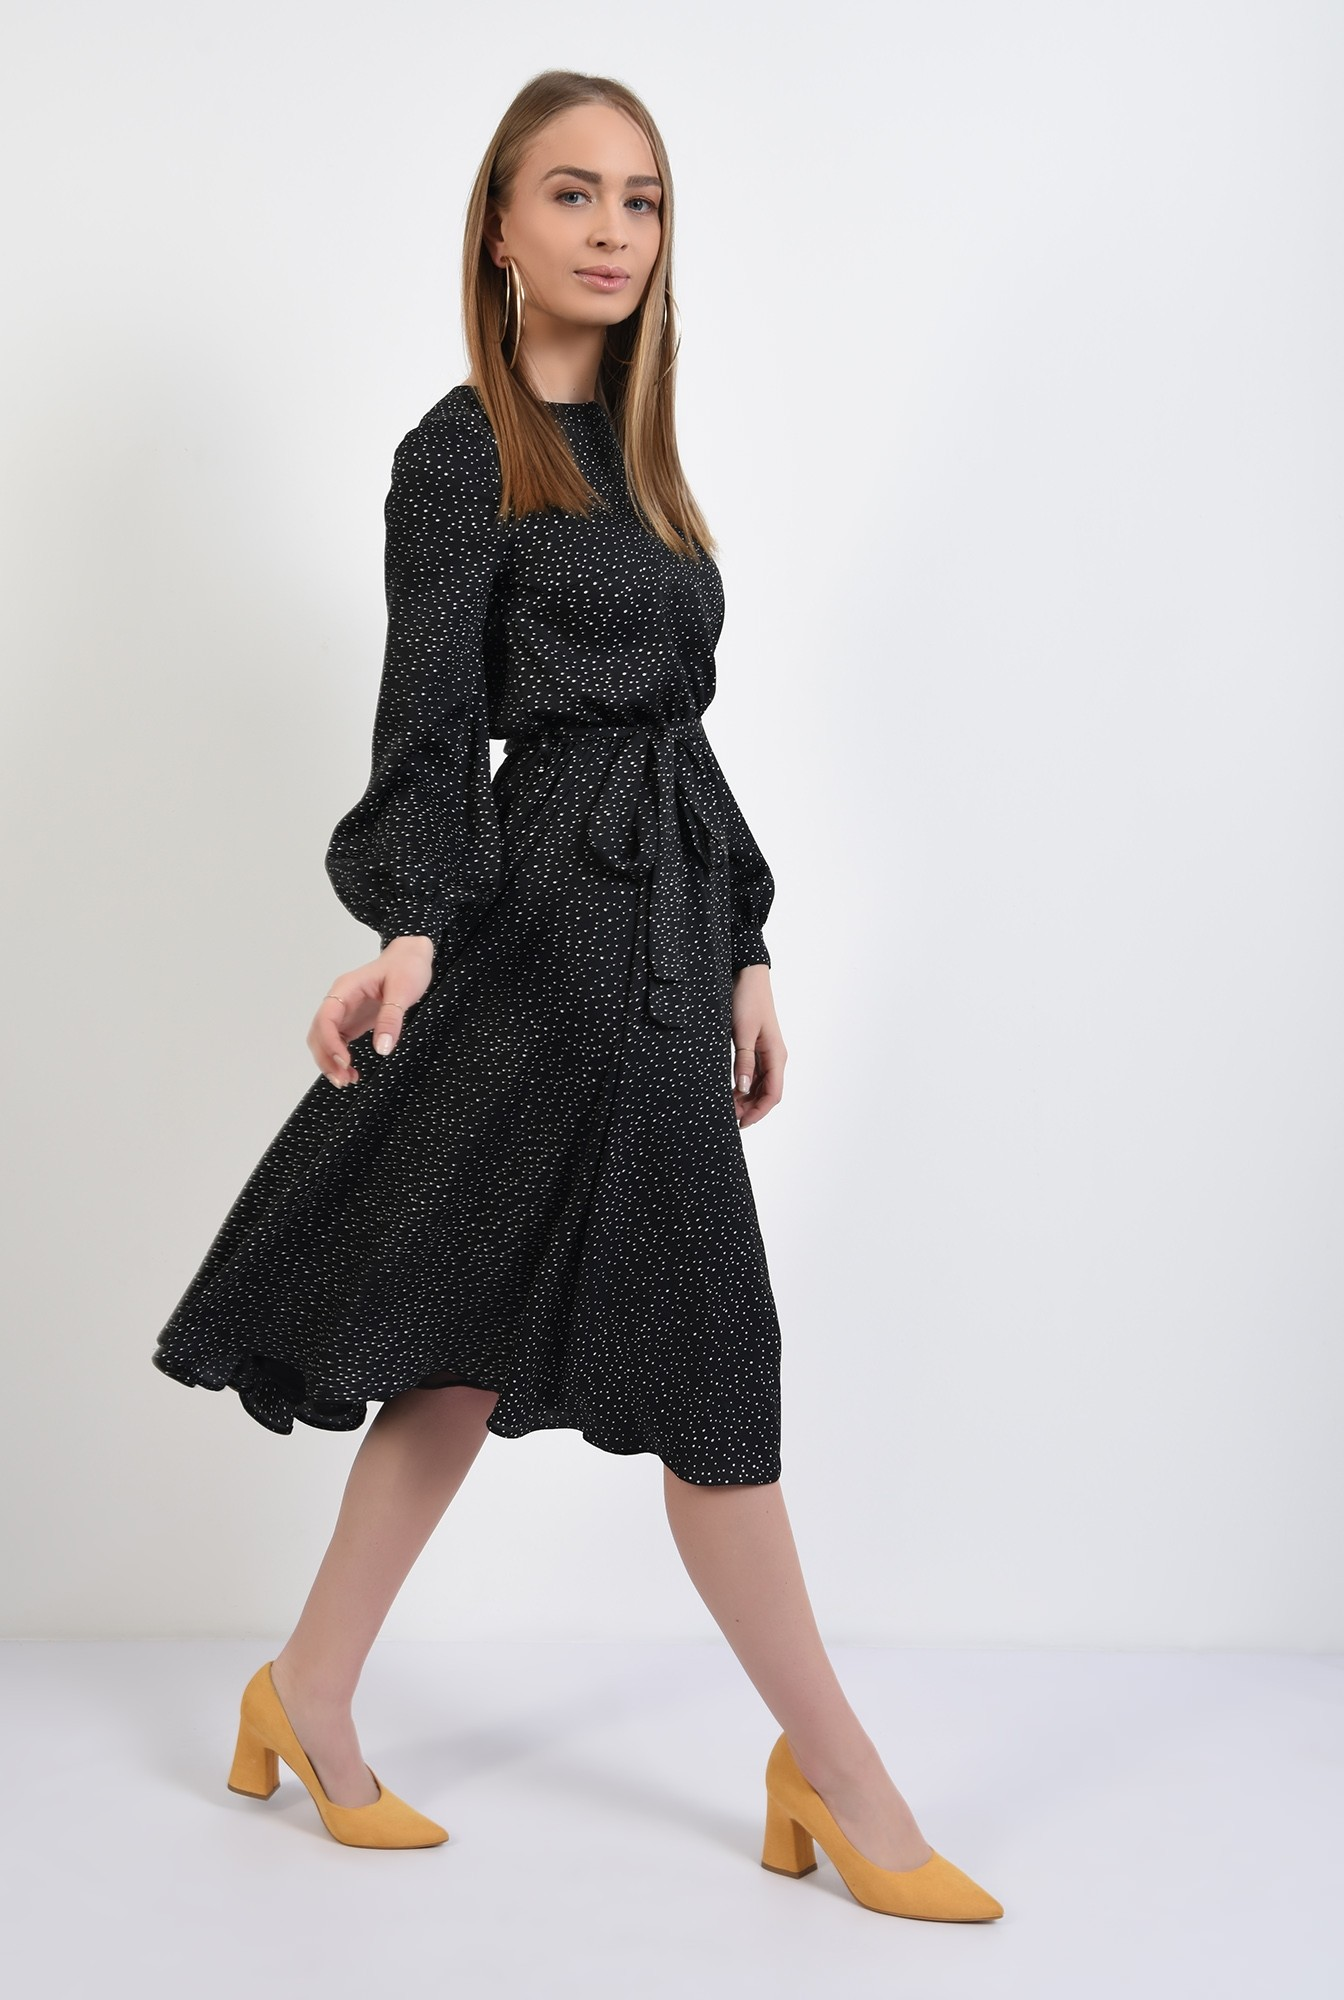 3 - 360 - rochie midi, cu picouri, satin imprimat, clos, rochie de primavara